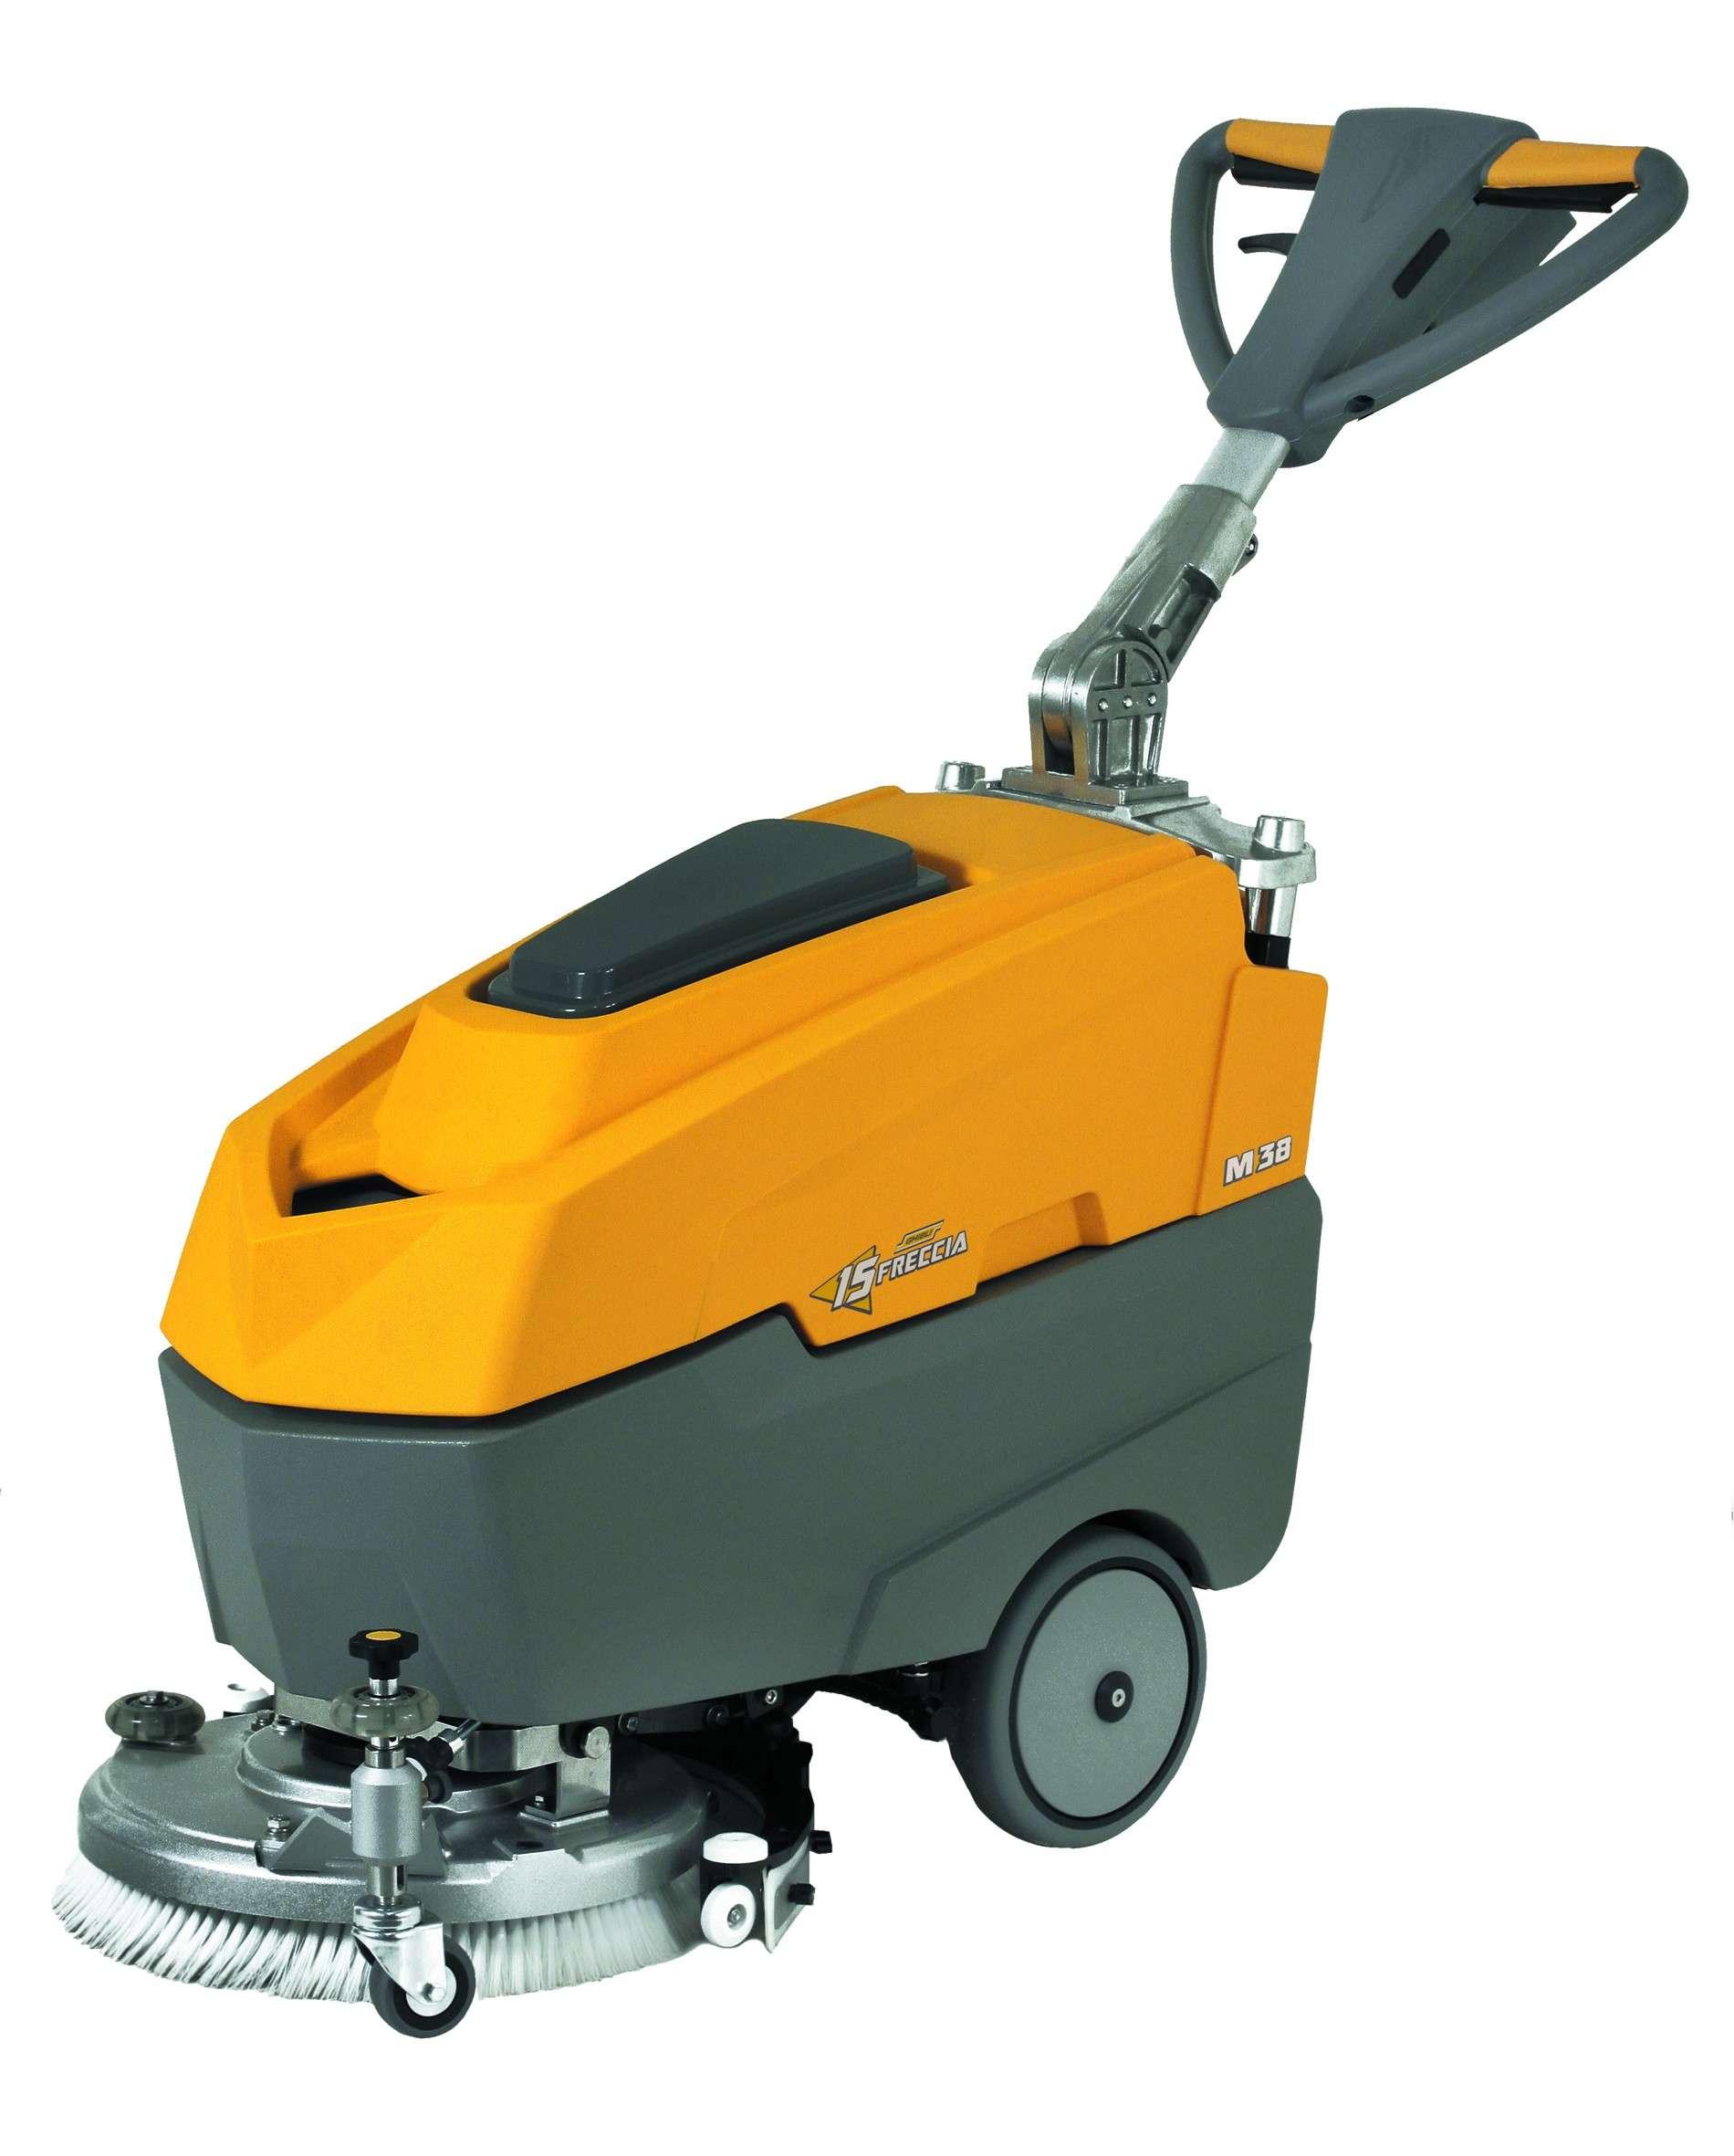 Ghibli freccia 15 compact floor scrubber powervac for Floor scrubber